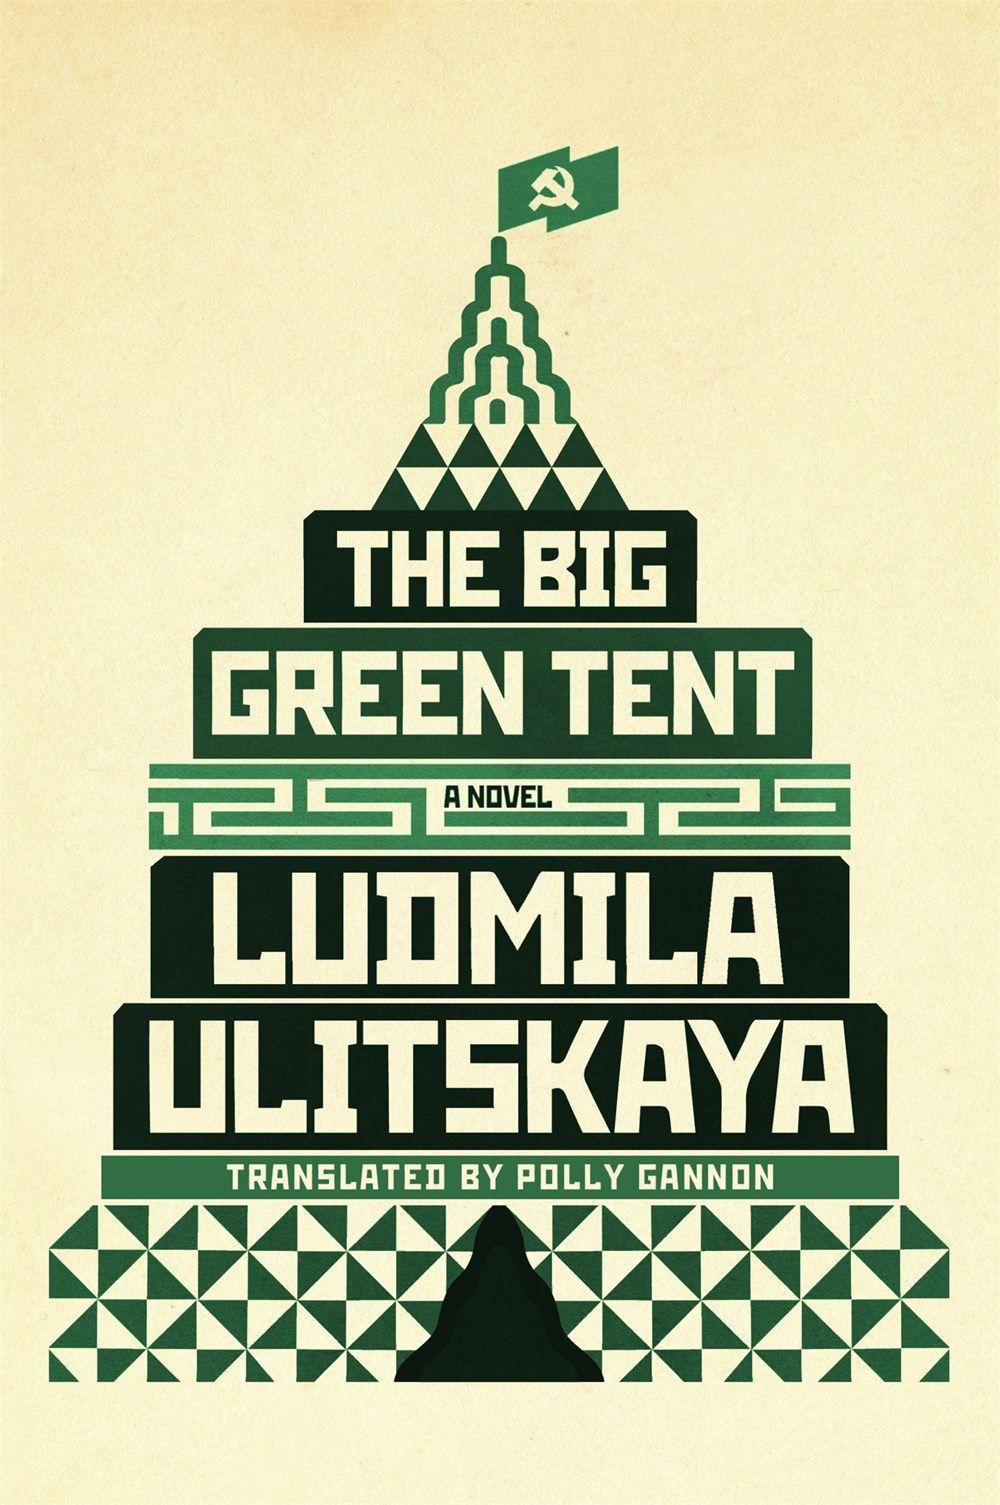 The Big Green Tent by Ludmila Ulitskaya (November 2015)